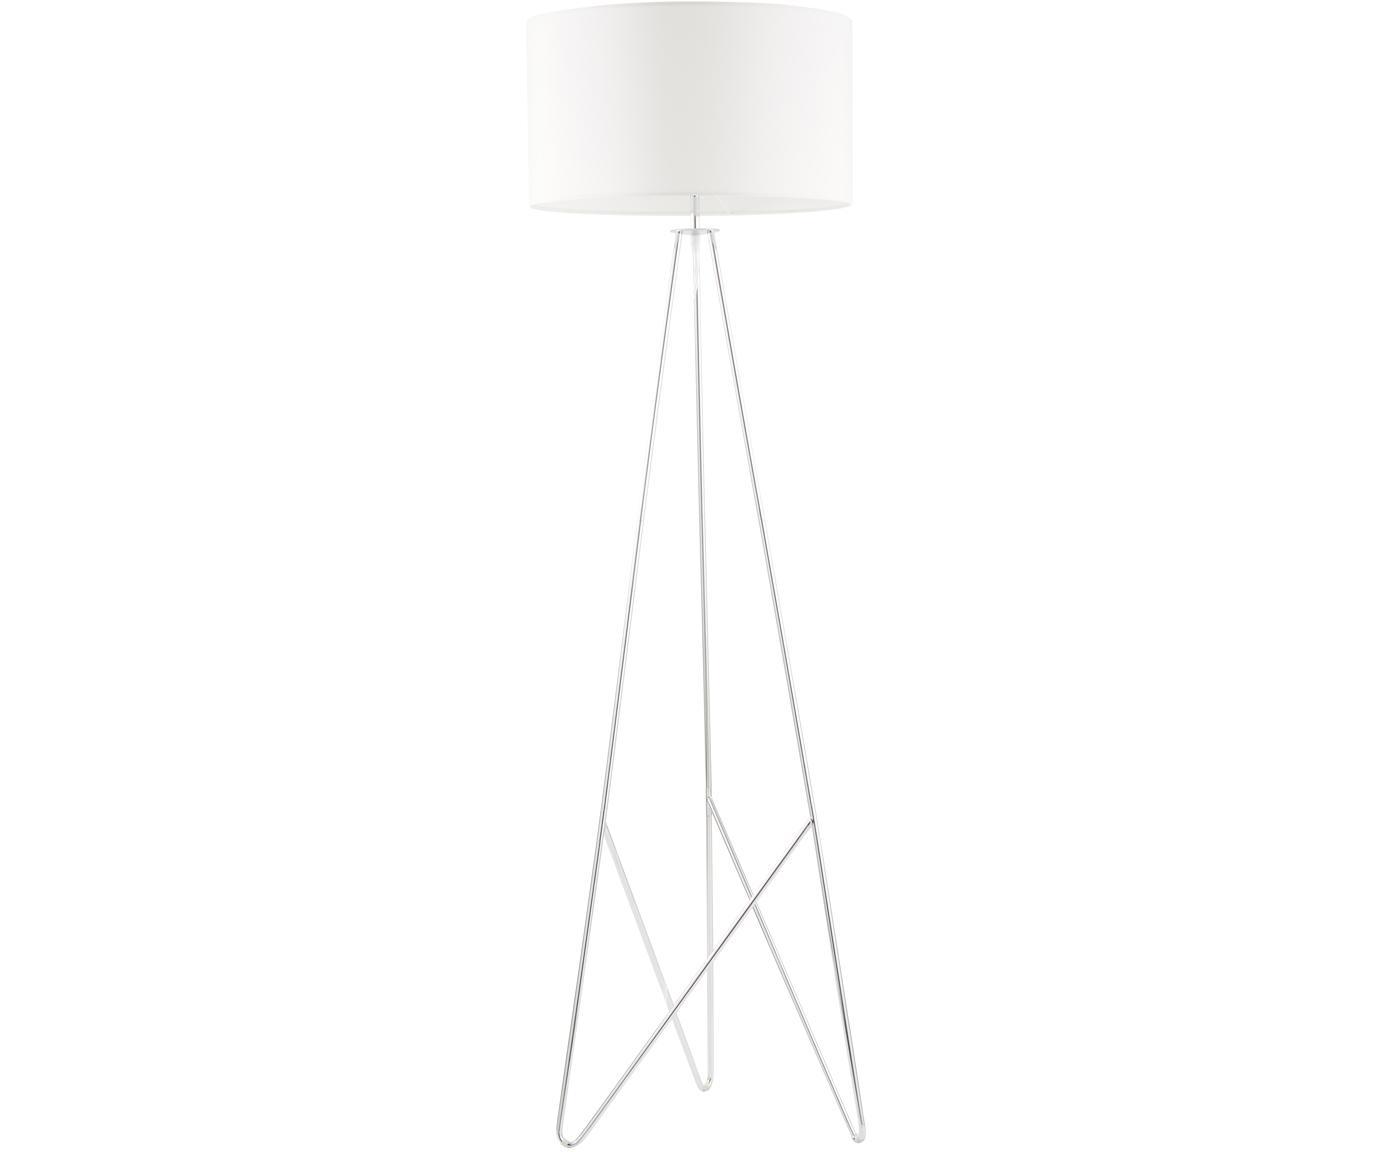 Vloerlamp Jessica, Lampenkap: textiel, Lampvoet: verchroomd metaal, Wit, chroomkleurig, Ø 45 x H 155 cm